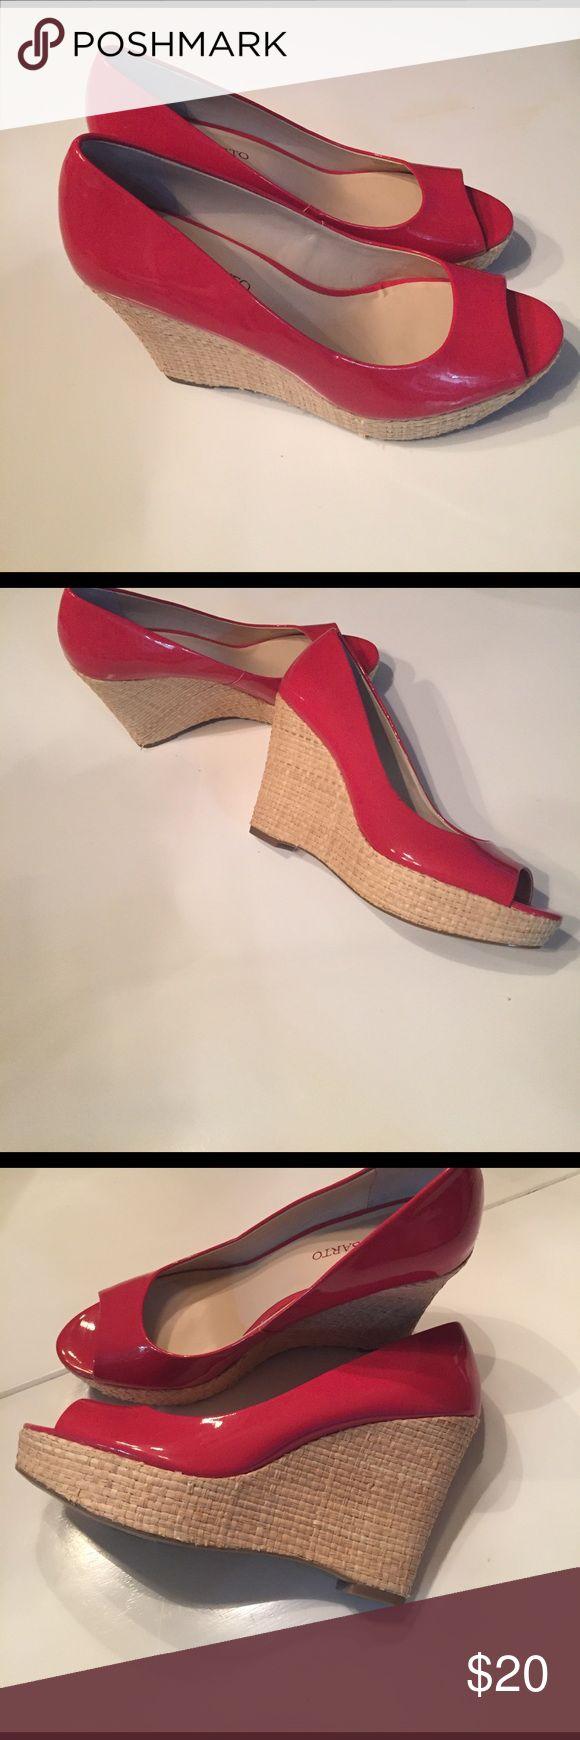 Franco Sarto peep toe wedge pump Franco Sarto Women's Surf Wedge Pump size 9.5 US Franco Sarto Shoes Wedges